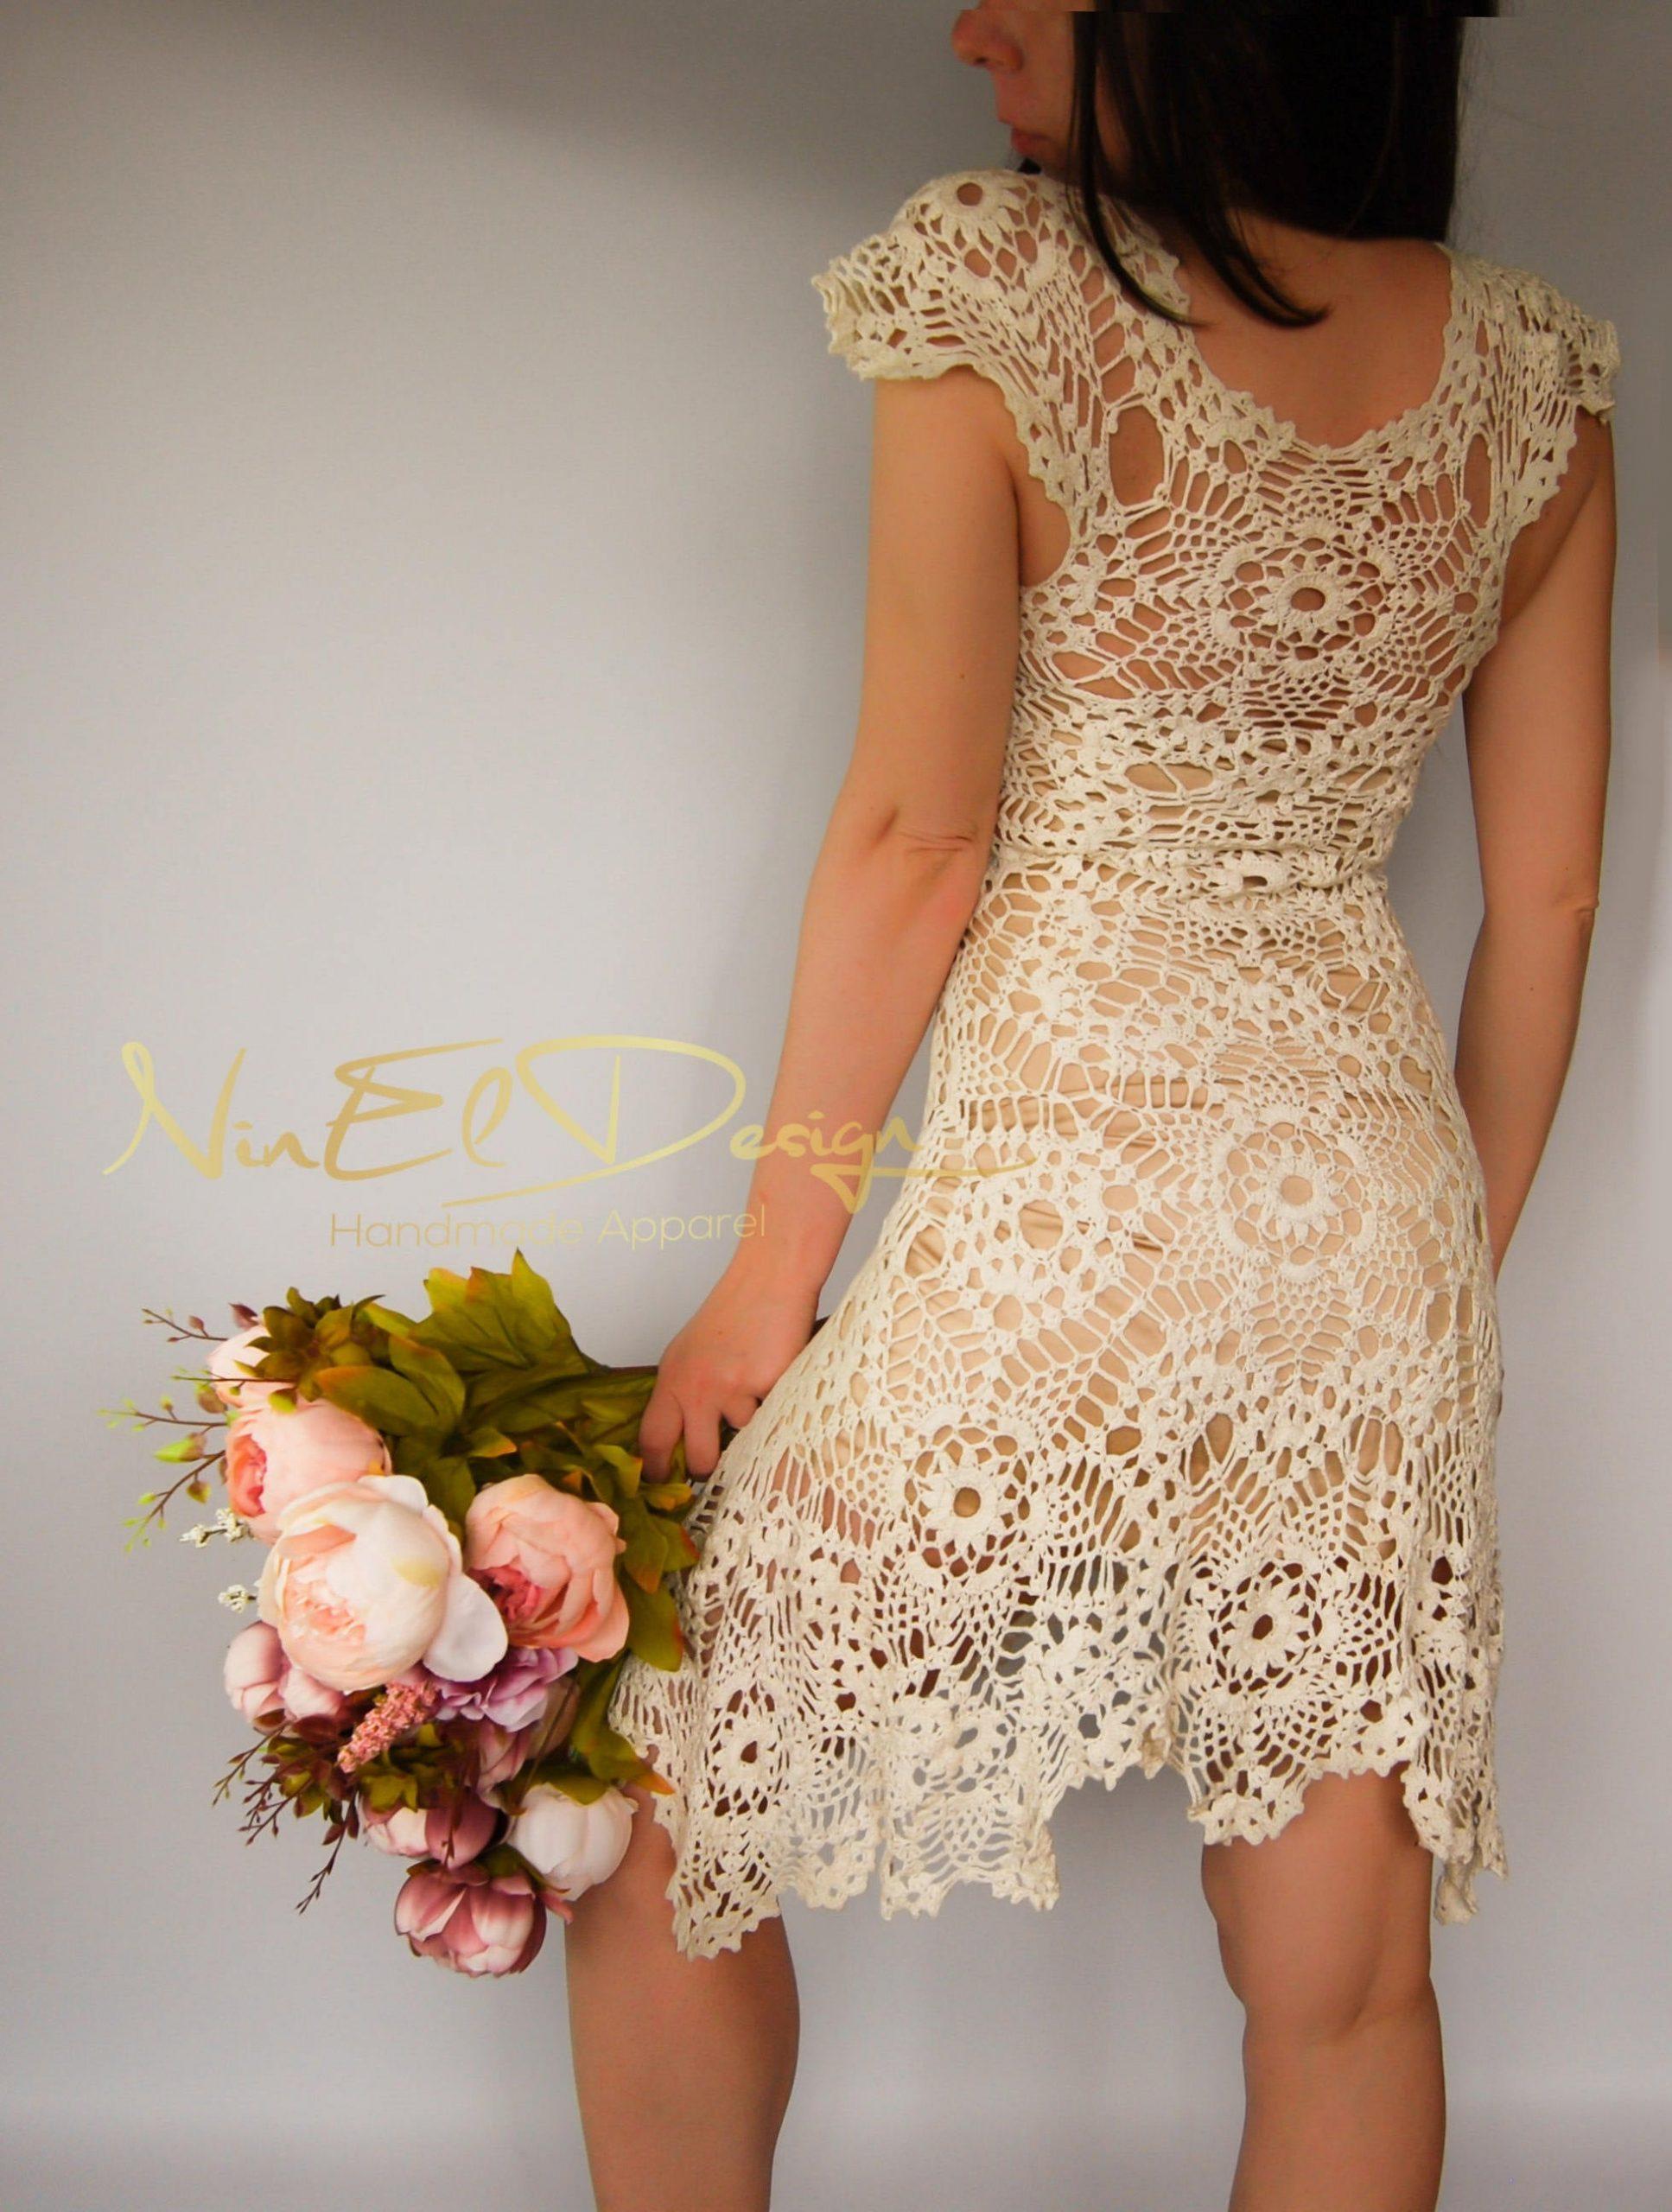 Beige Häkelkleid Häkeln Sie Hochzeitskleid Minikleid Häkeln